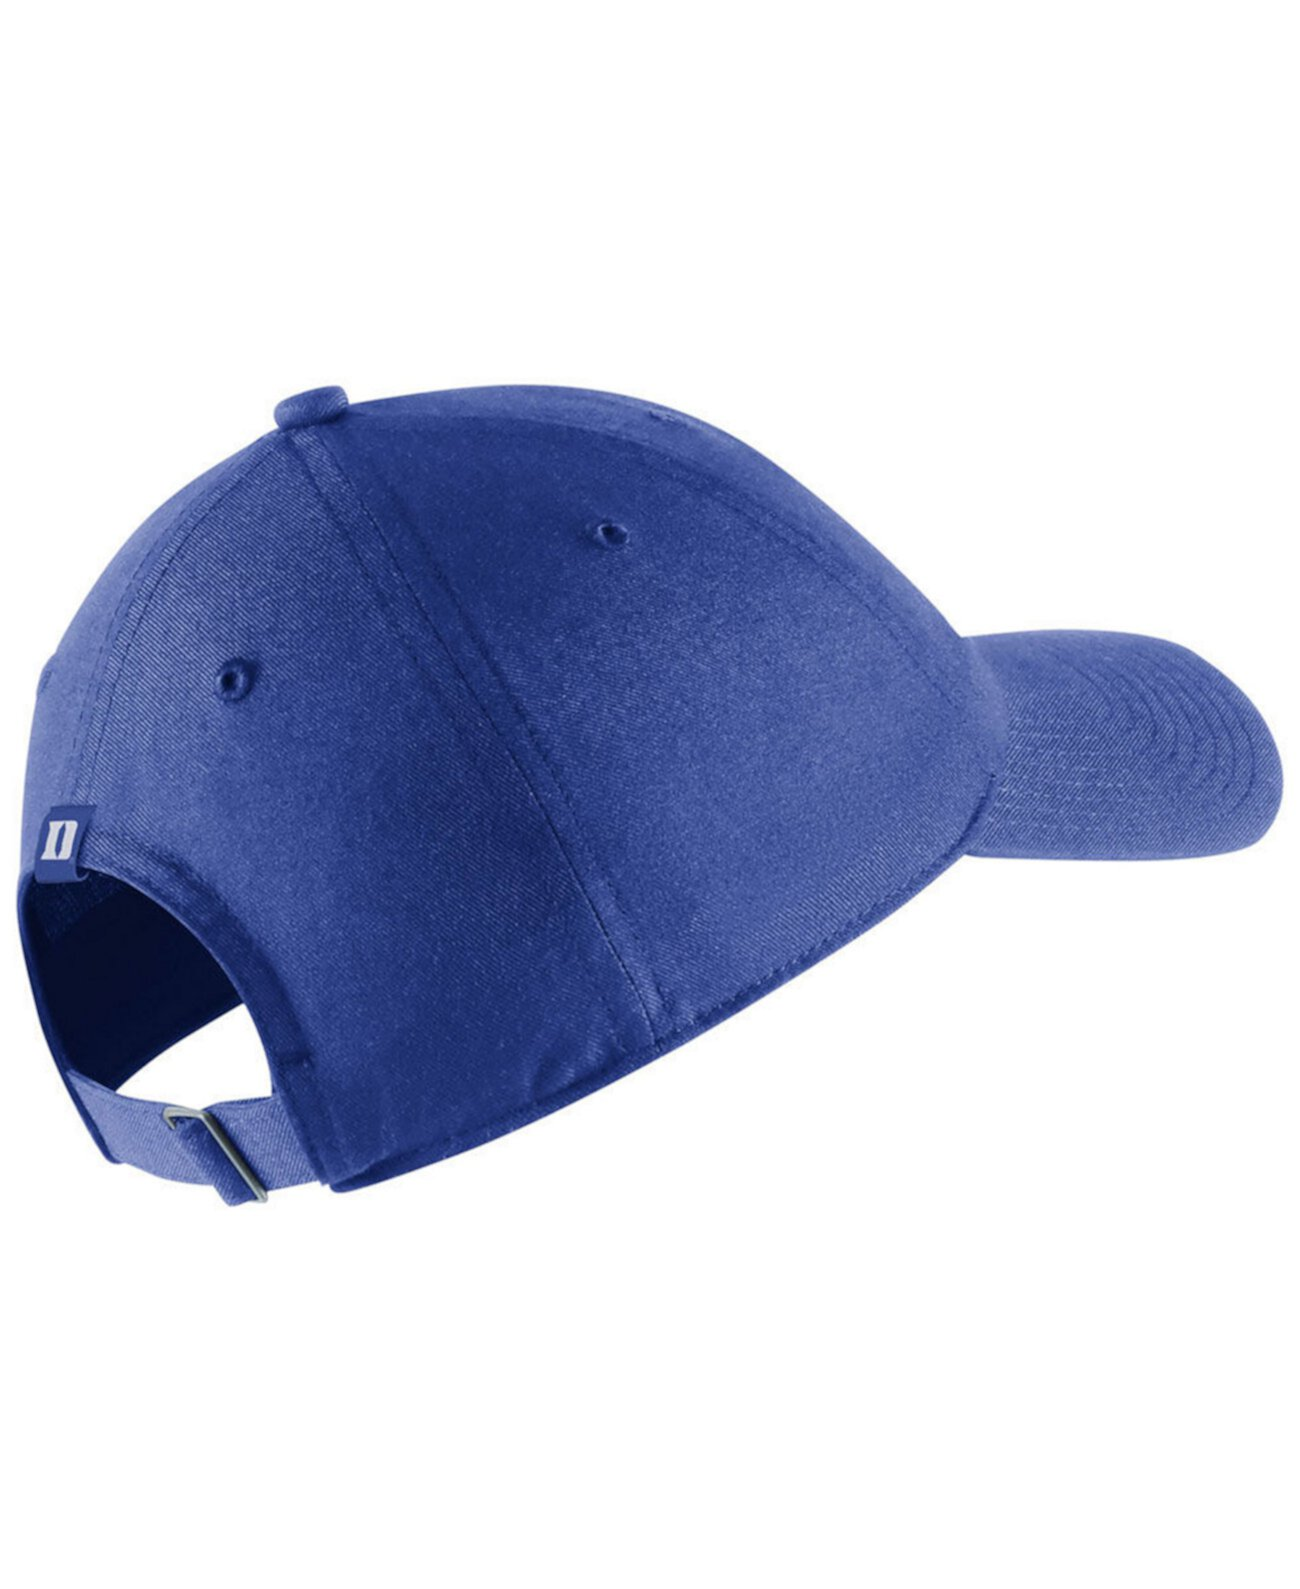 Герцог Голубые дьяволы H86 Wordmark Шапочка Swoosh Nike